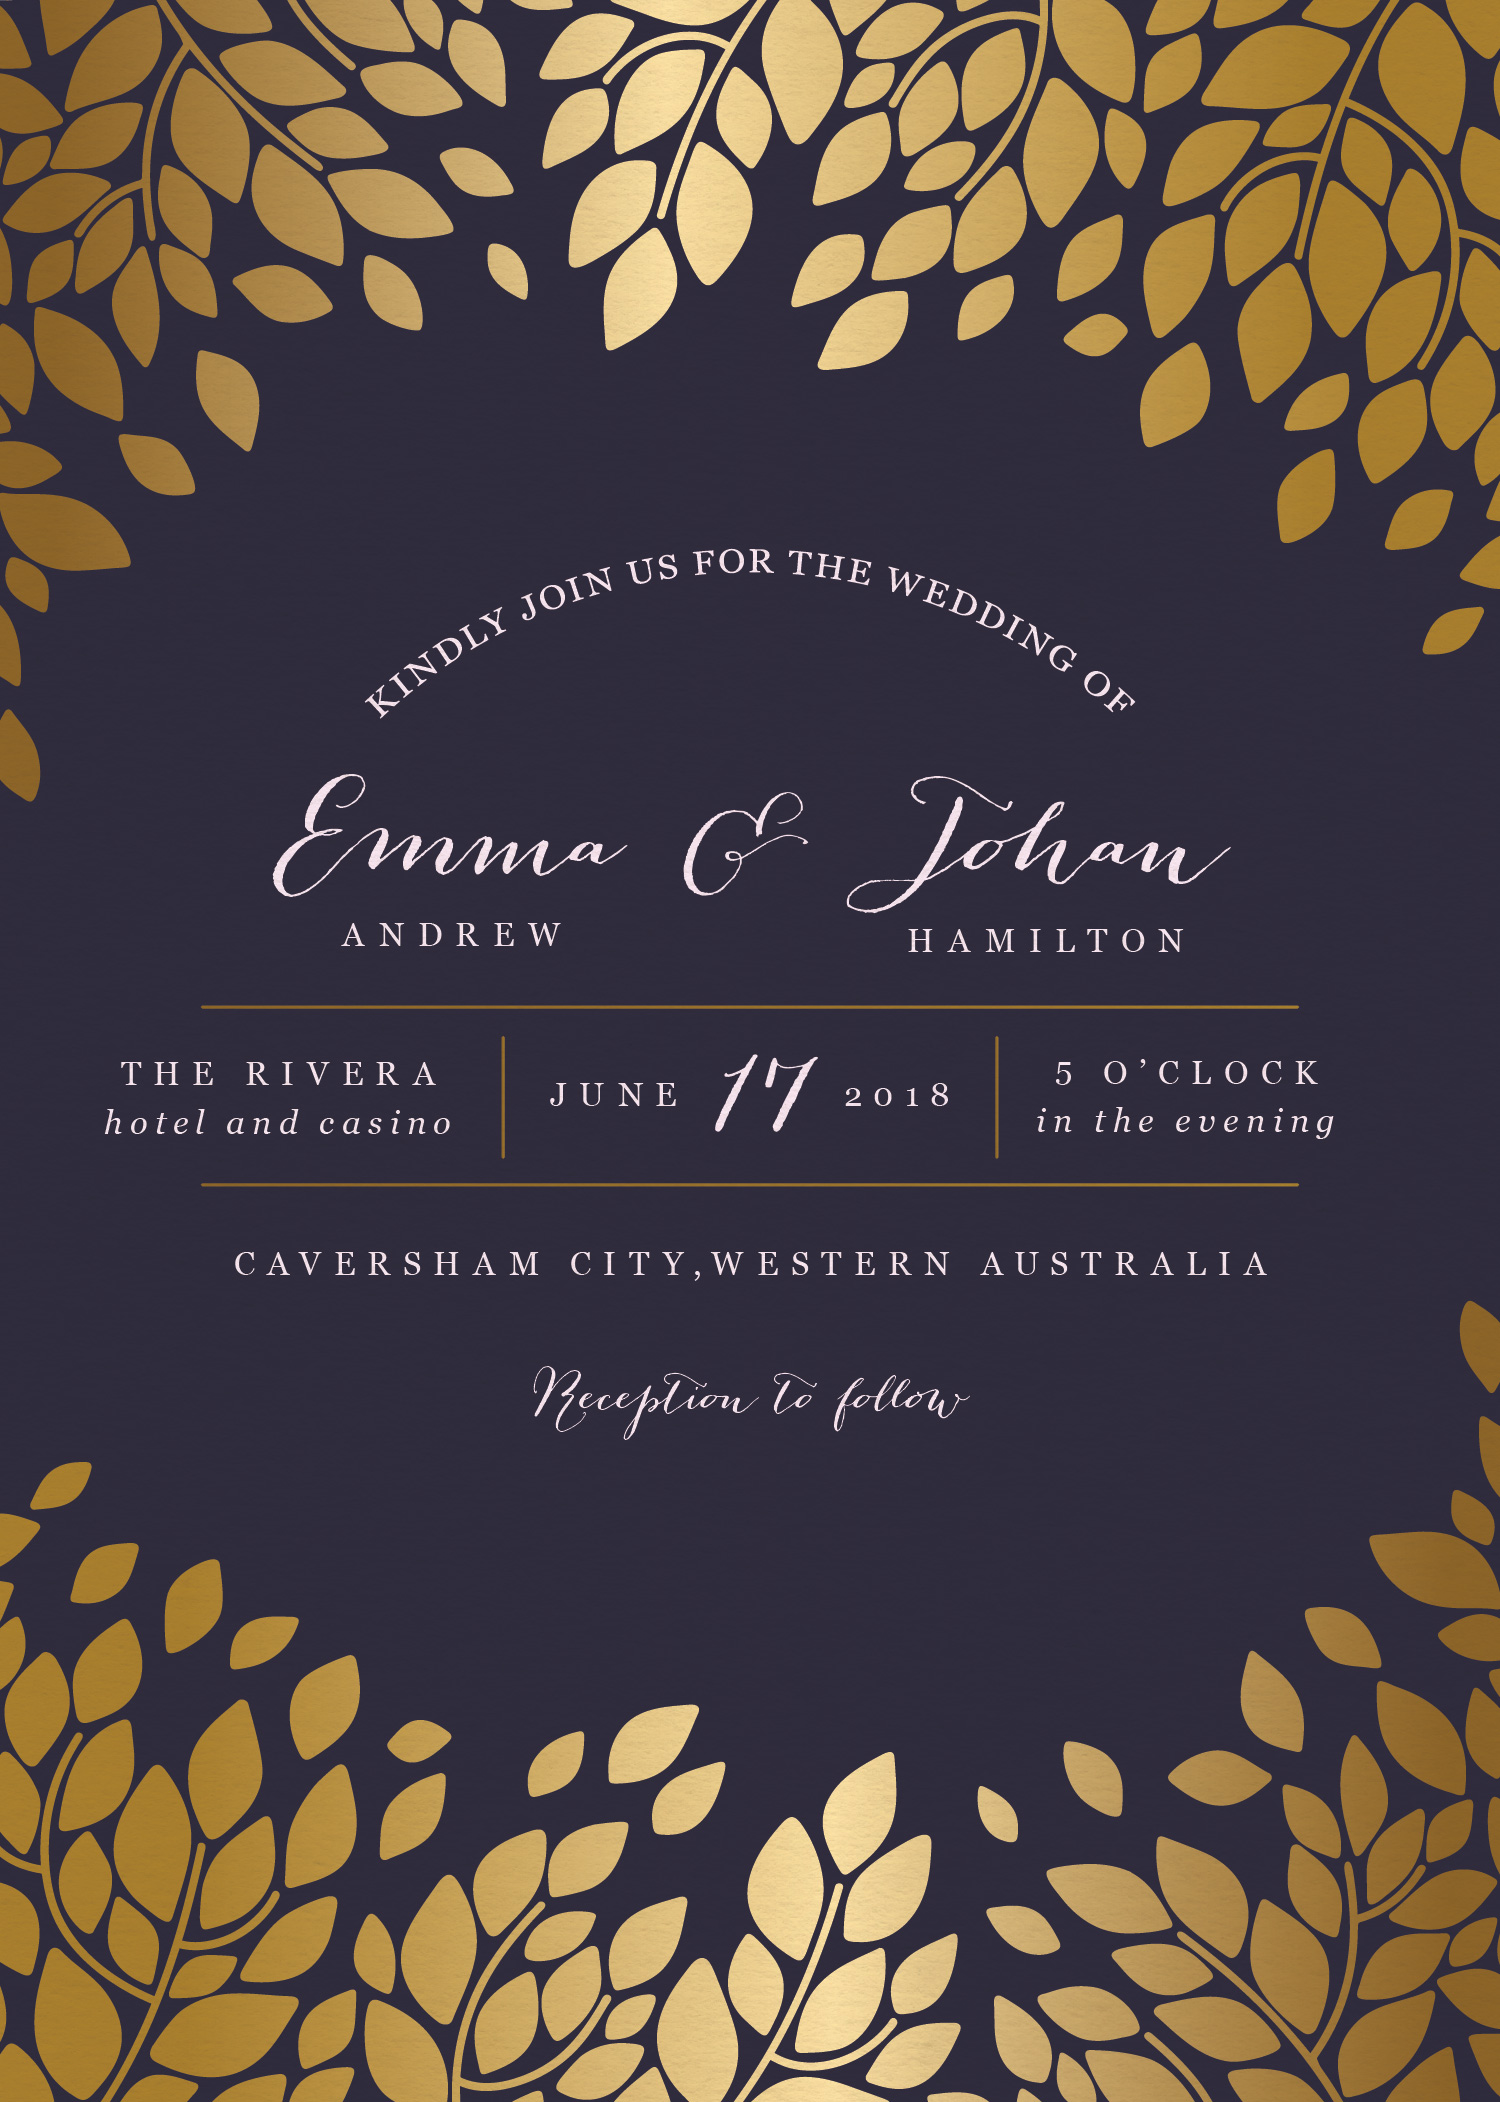 Caesar Leaf - Wedding Invitations